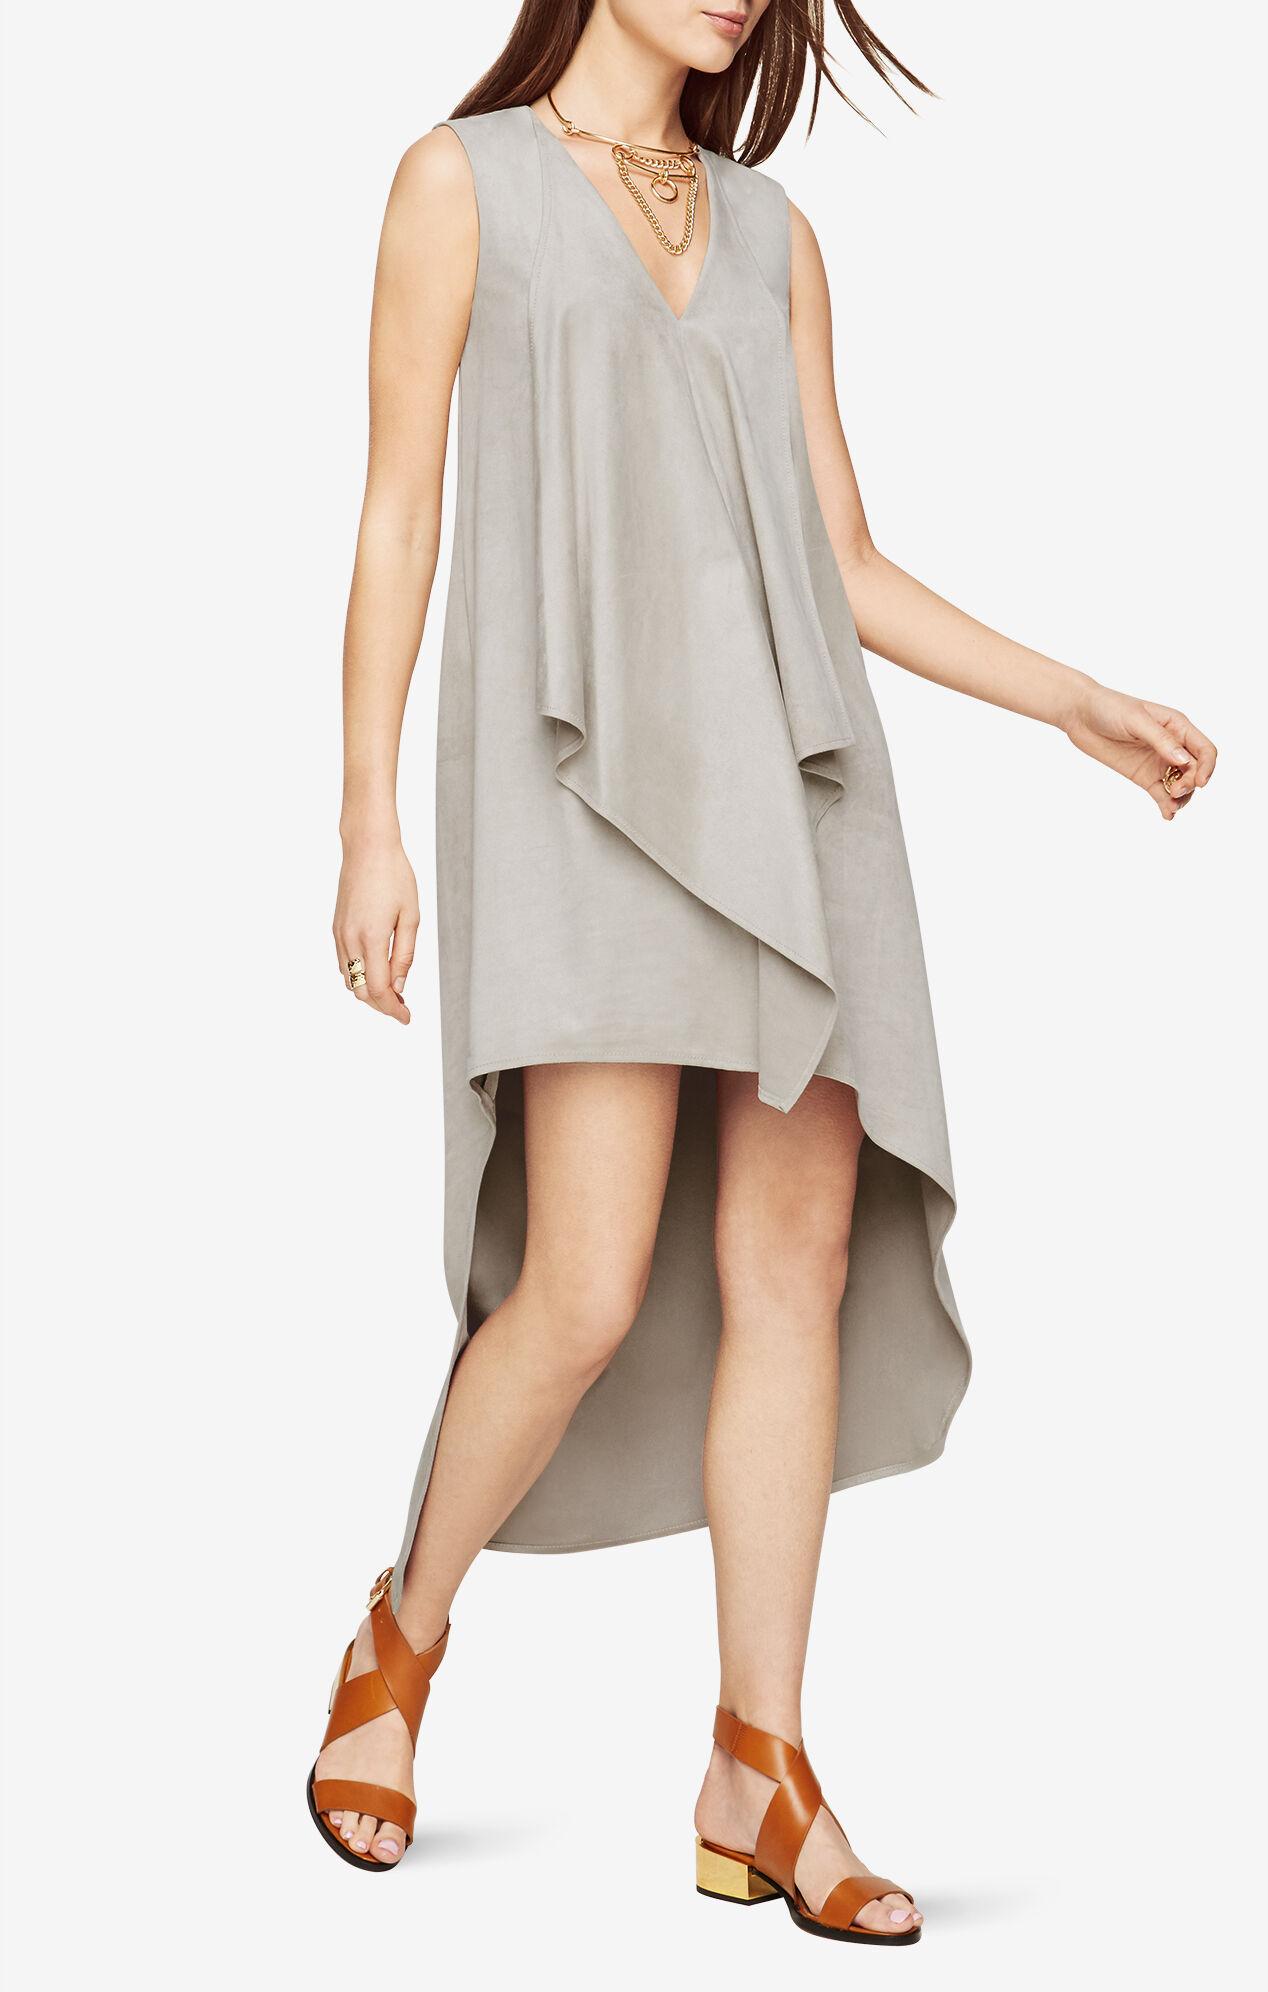 Tara Faux-Suede Dress